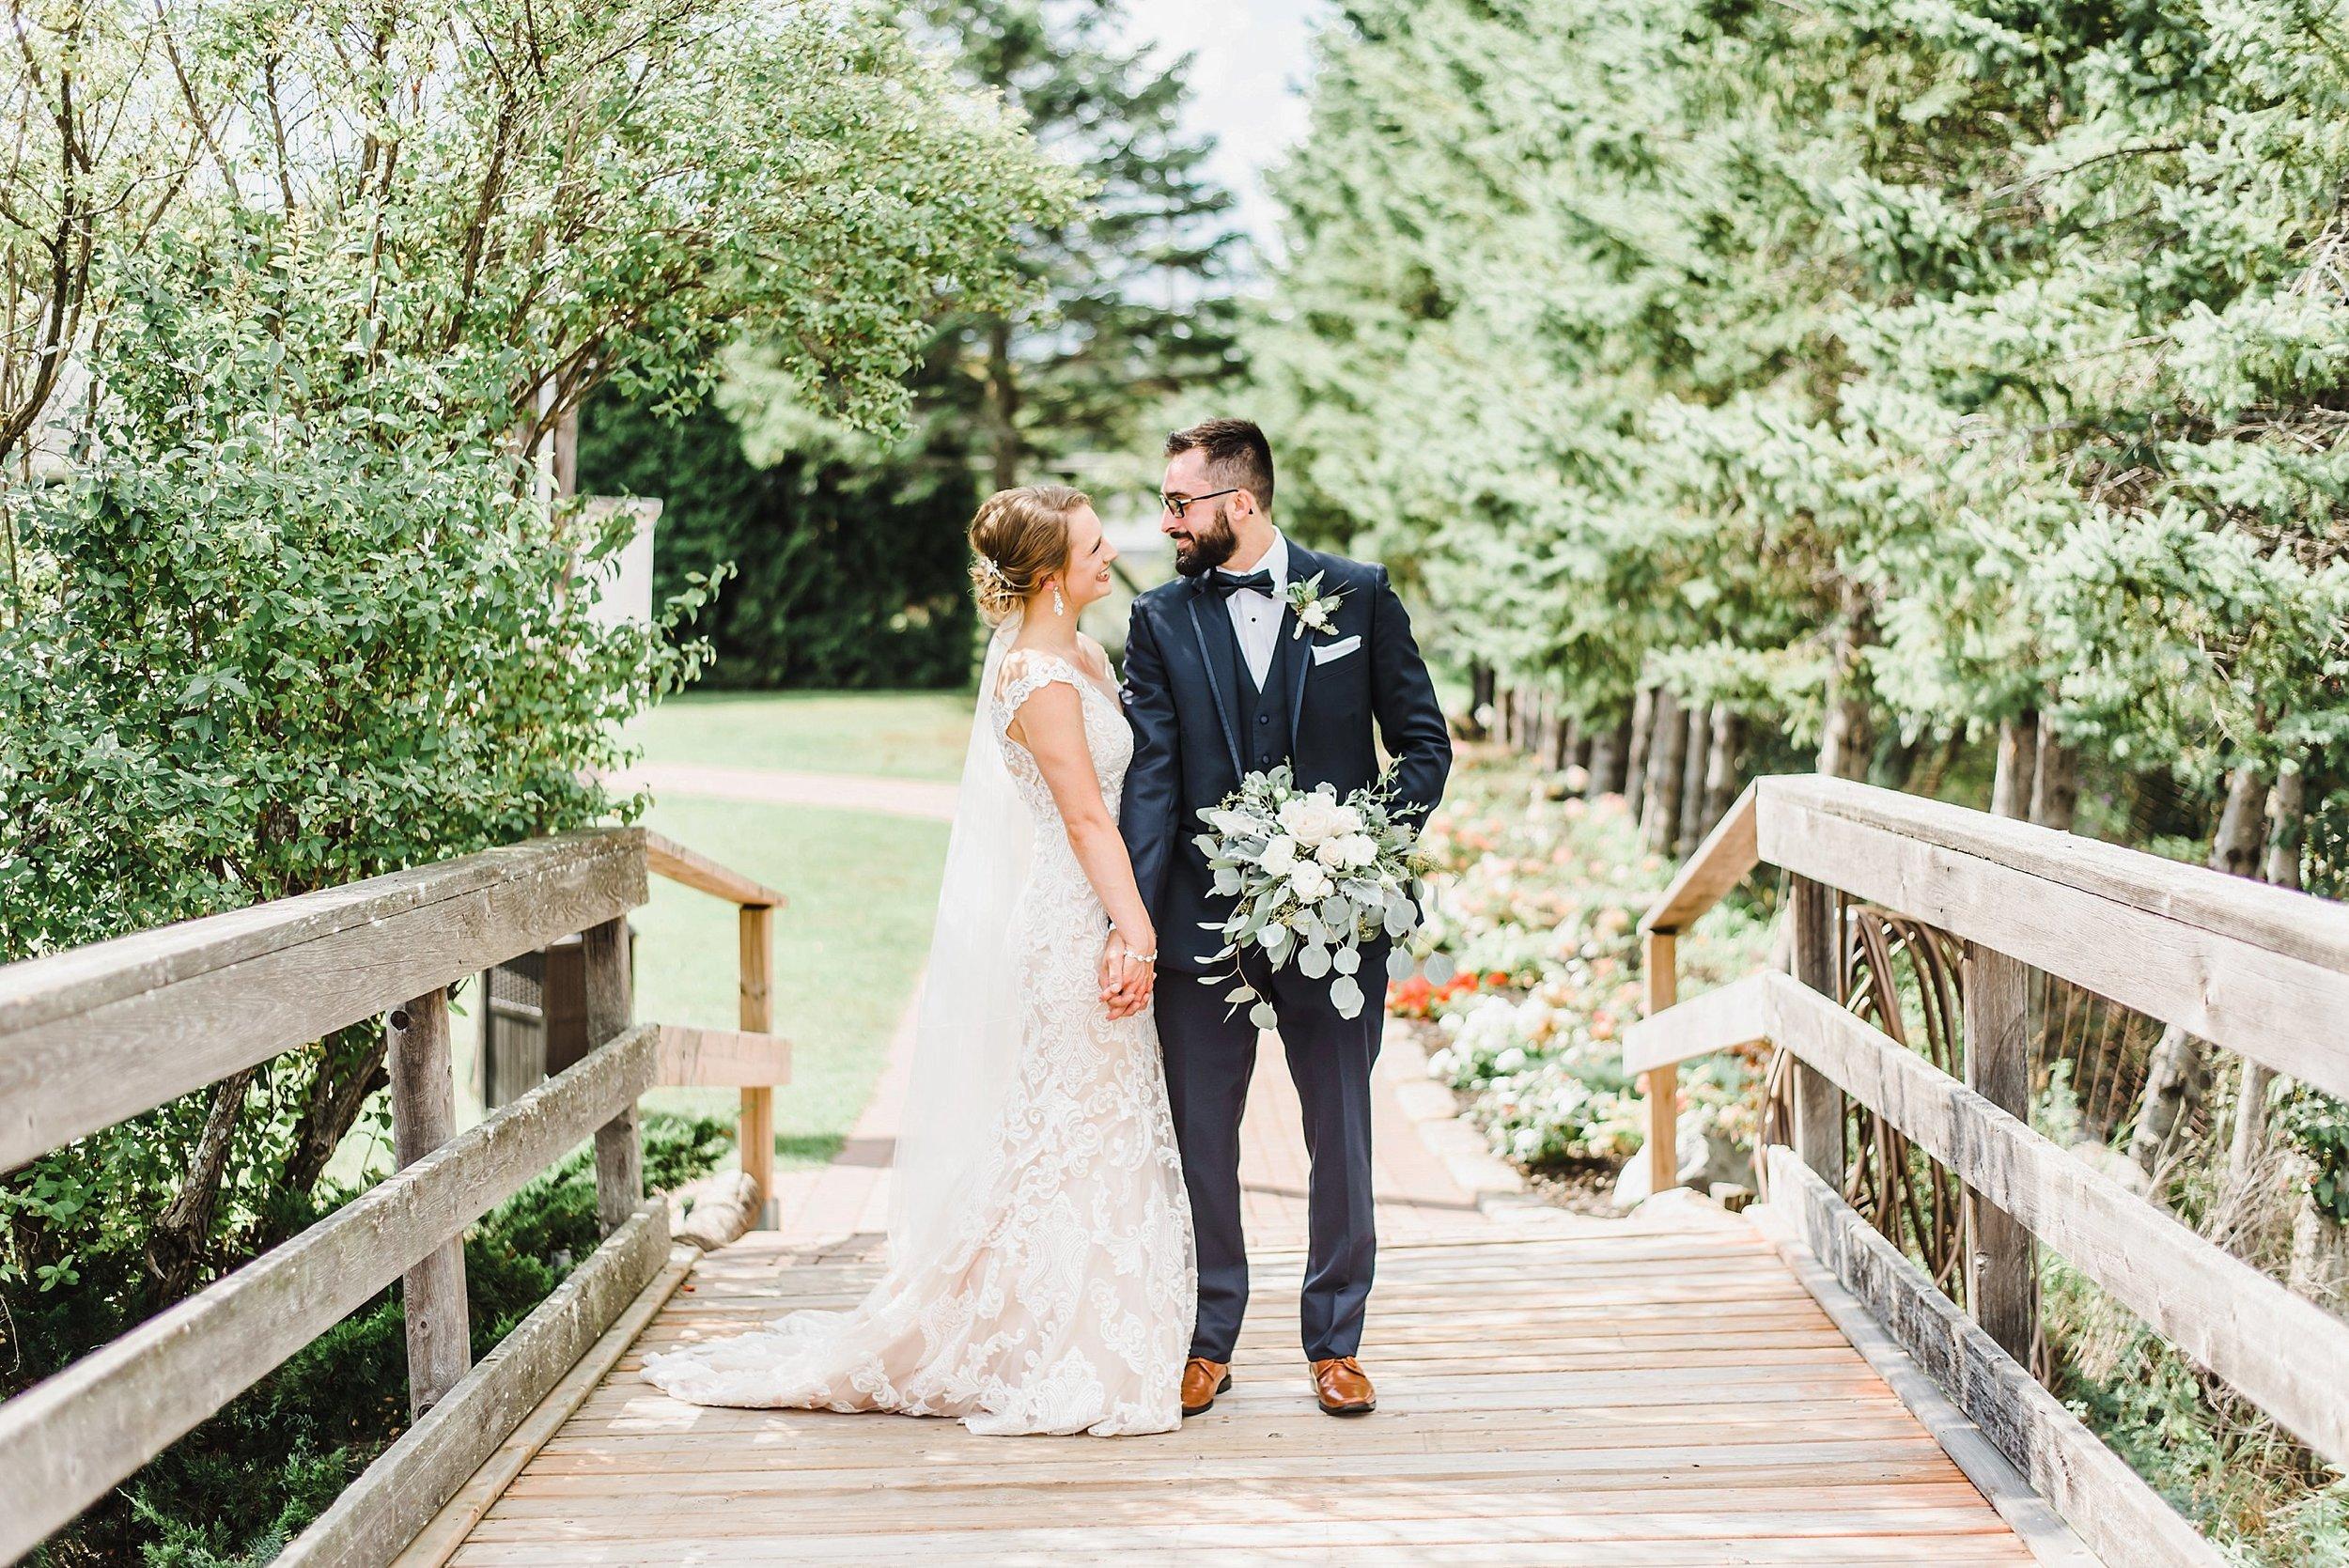 light airy indie fine art ottawa wedding photographer | Ali and Batoul Photography_1255.jpg